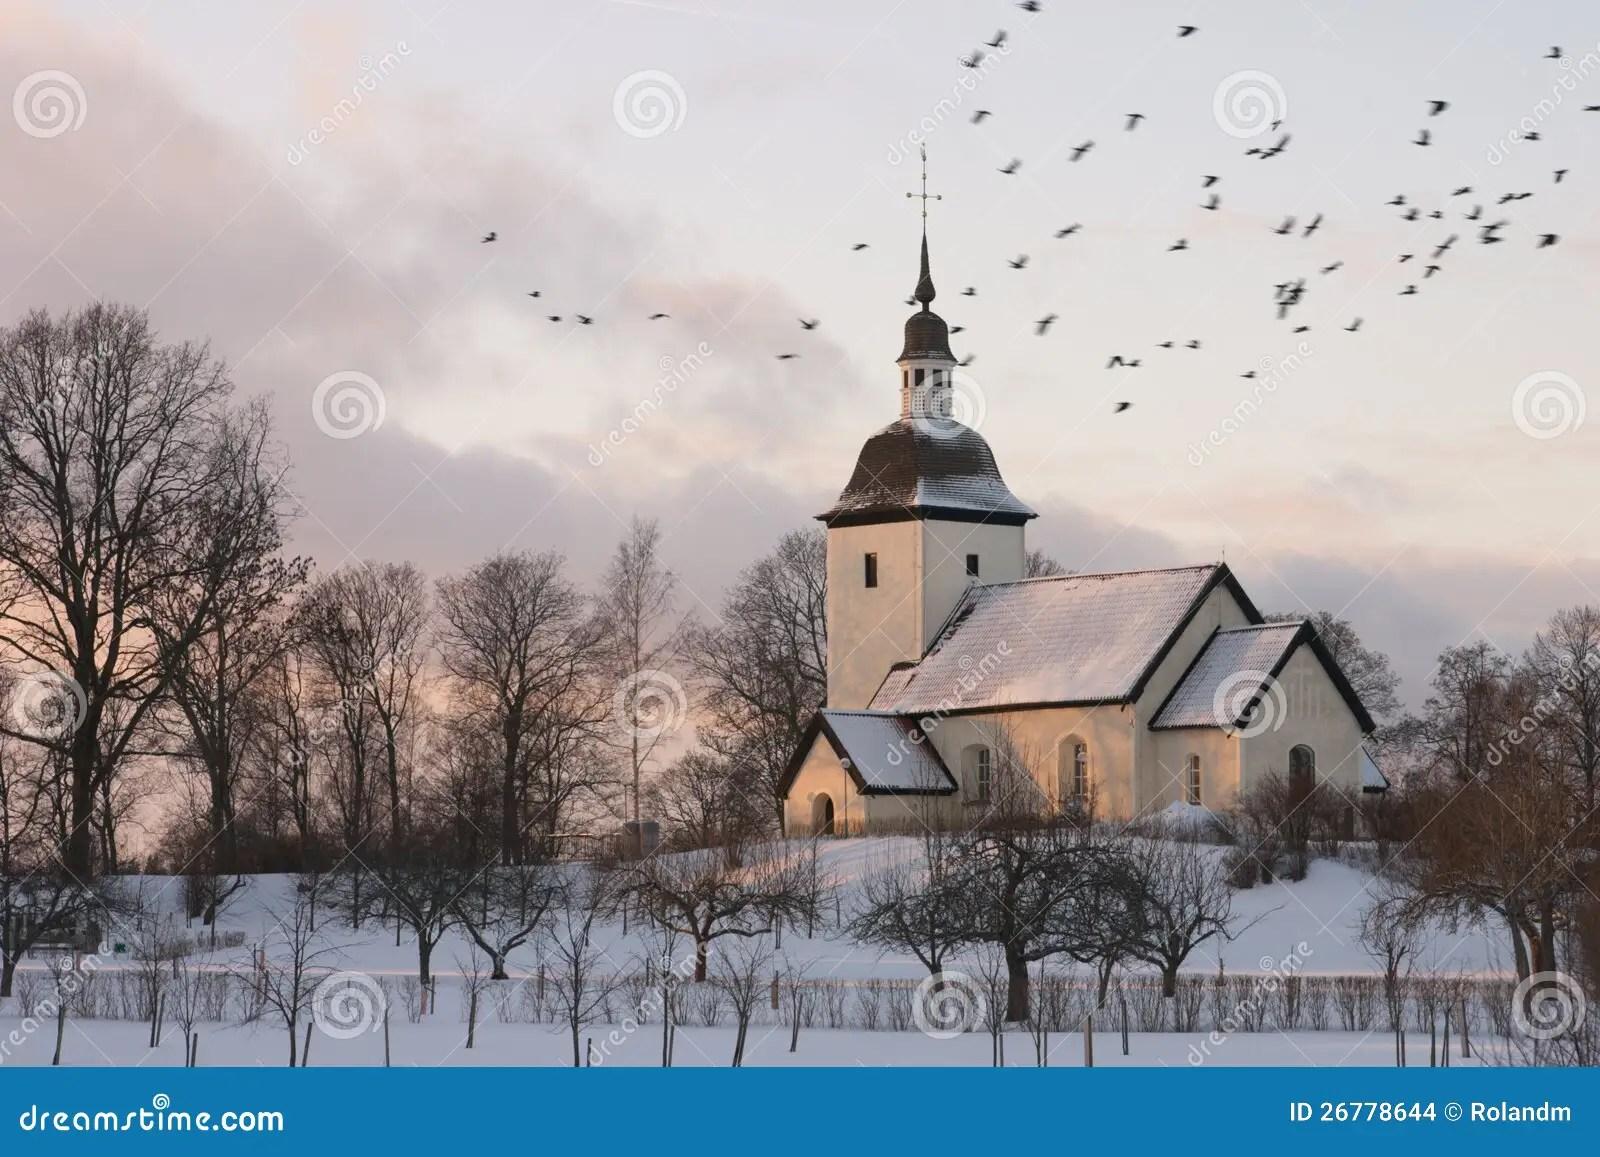 Free Christmas Falling Snow Wallpaper Swedish Church Winter Stock Photo Image Of Beautiful